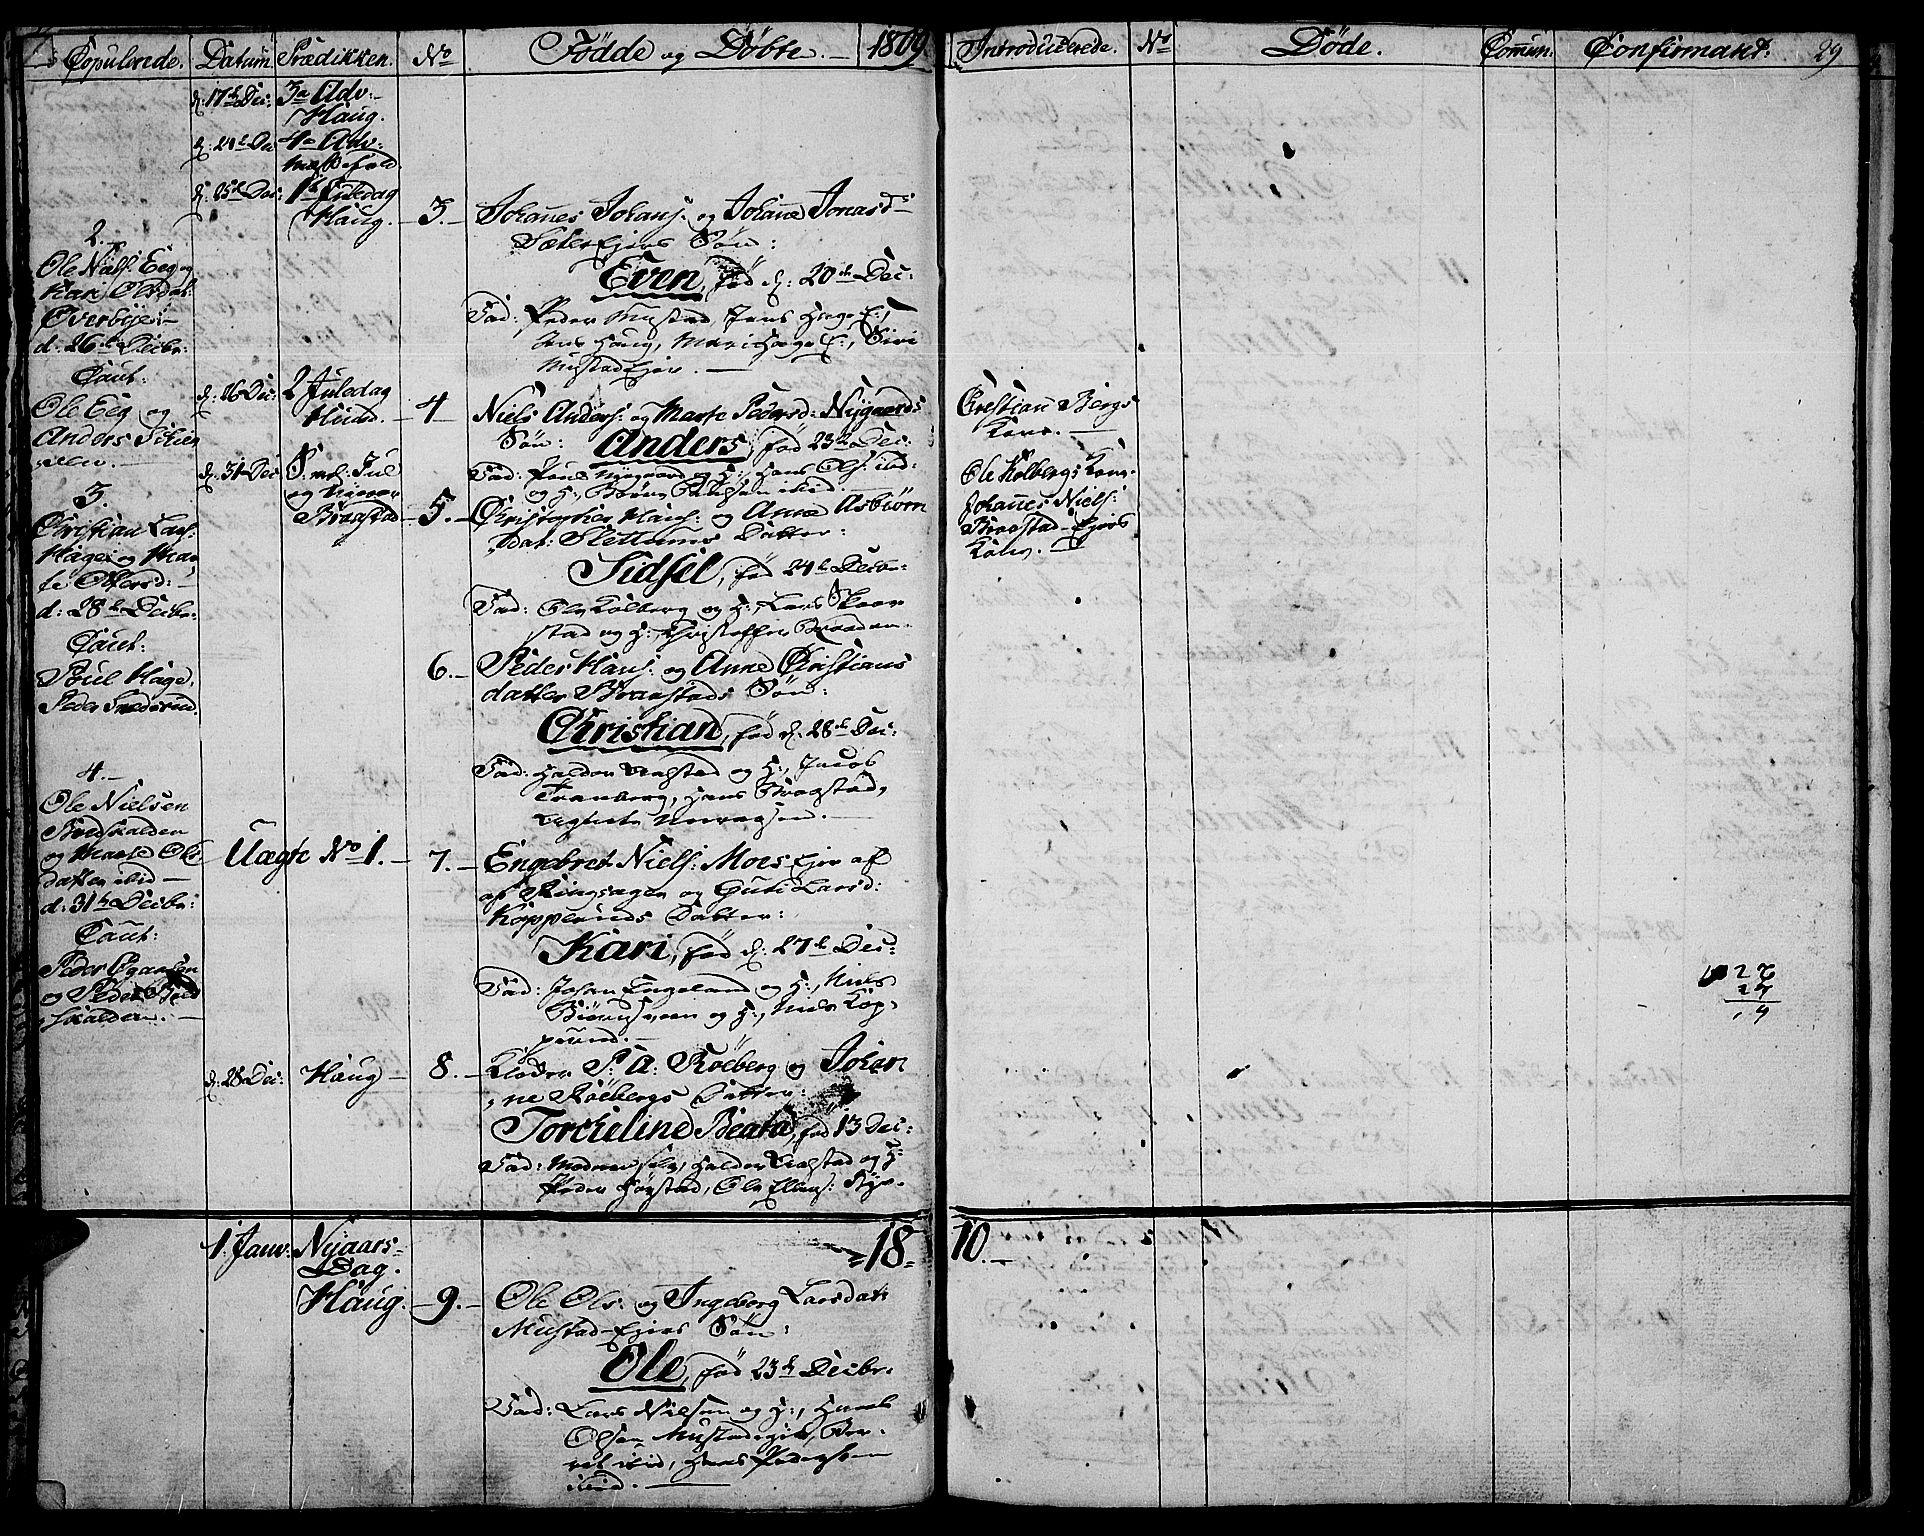 SAH, Vardal prestekontor, H/Ha/Haa/L0003: Ministerialbok nr. 3, 1808-1814, s. 28-29